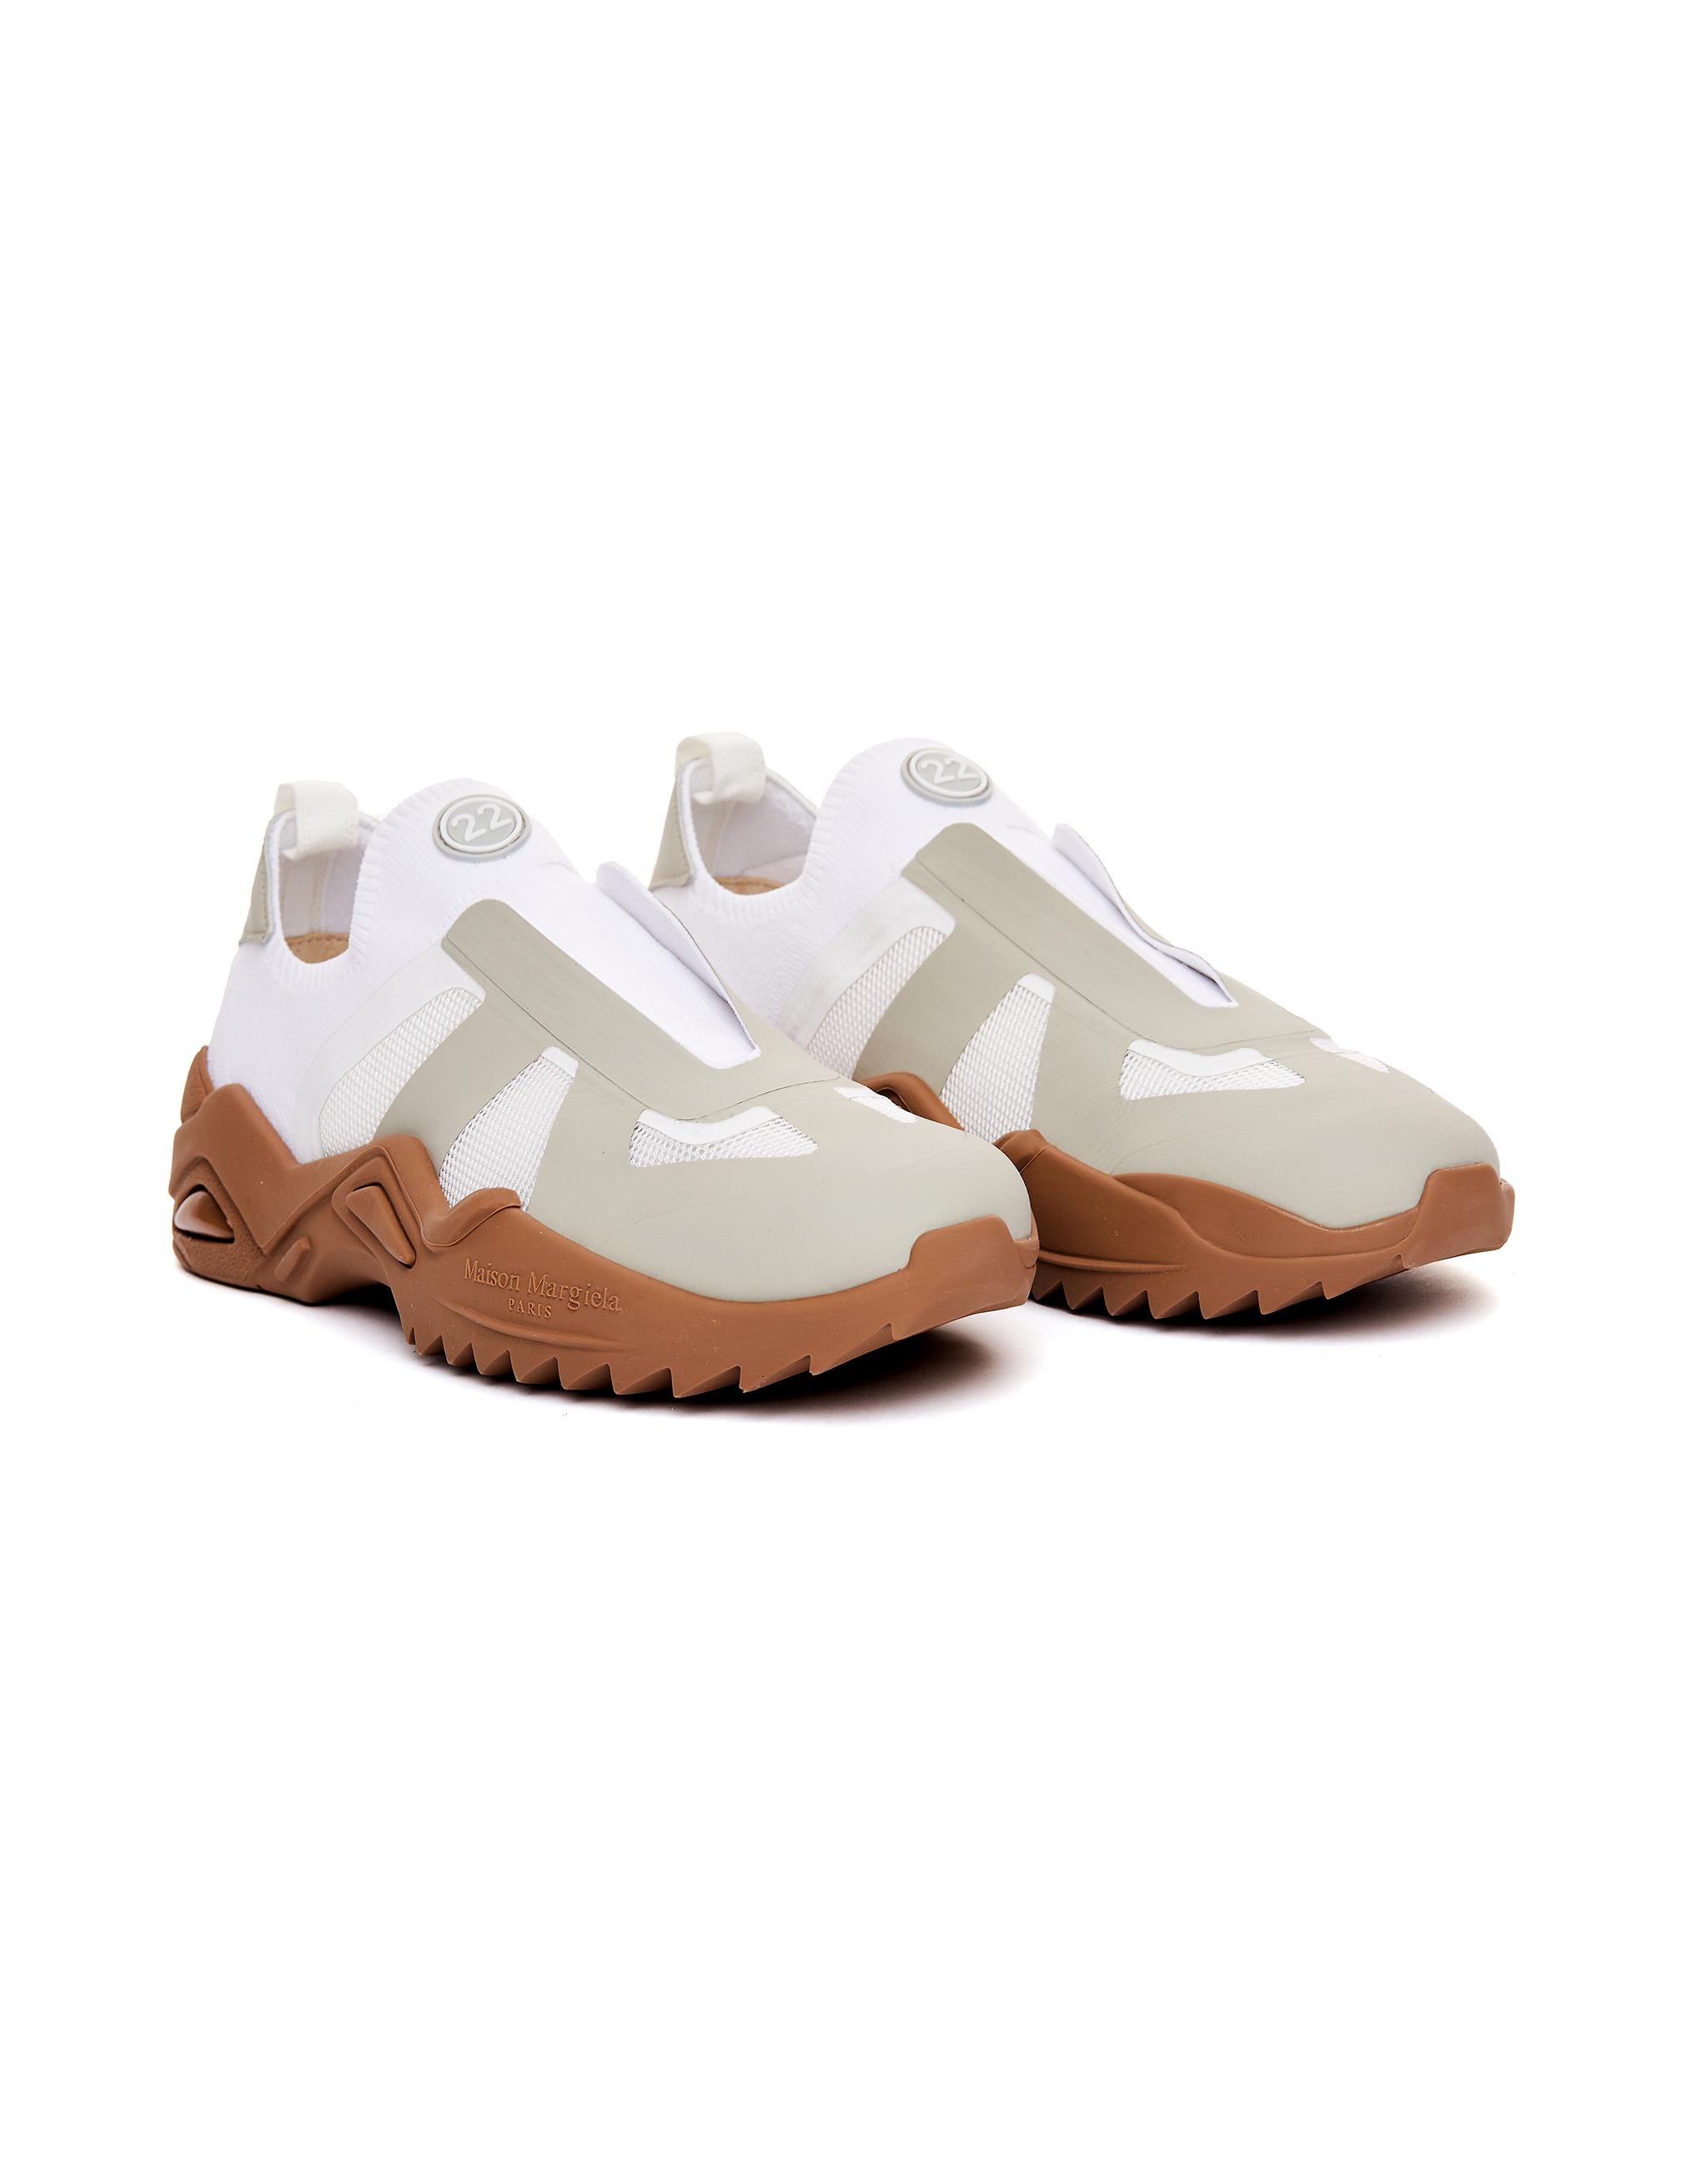 Maison Margiela White Leather New Replica Sneakers